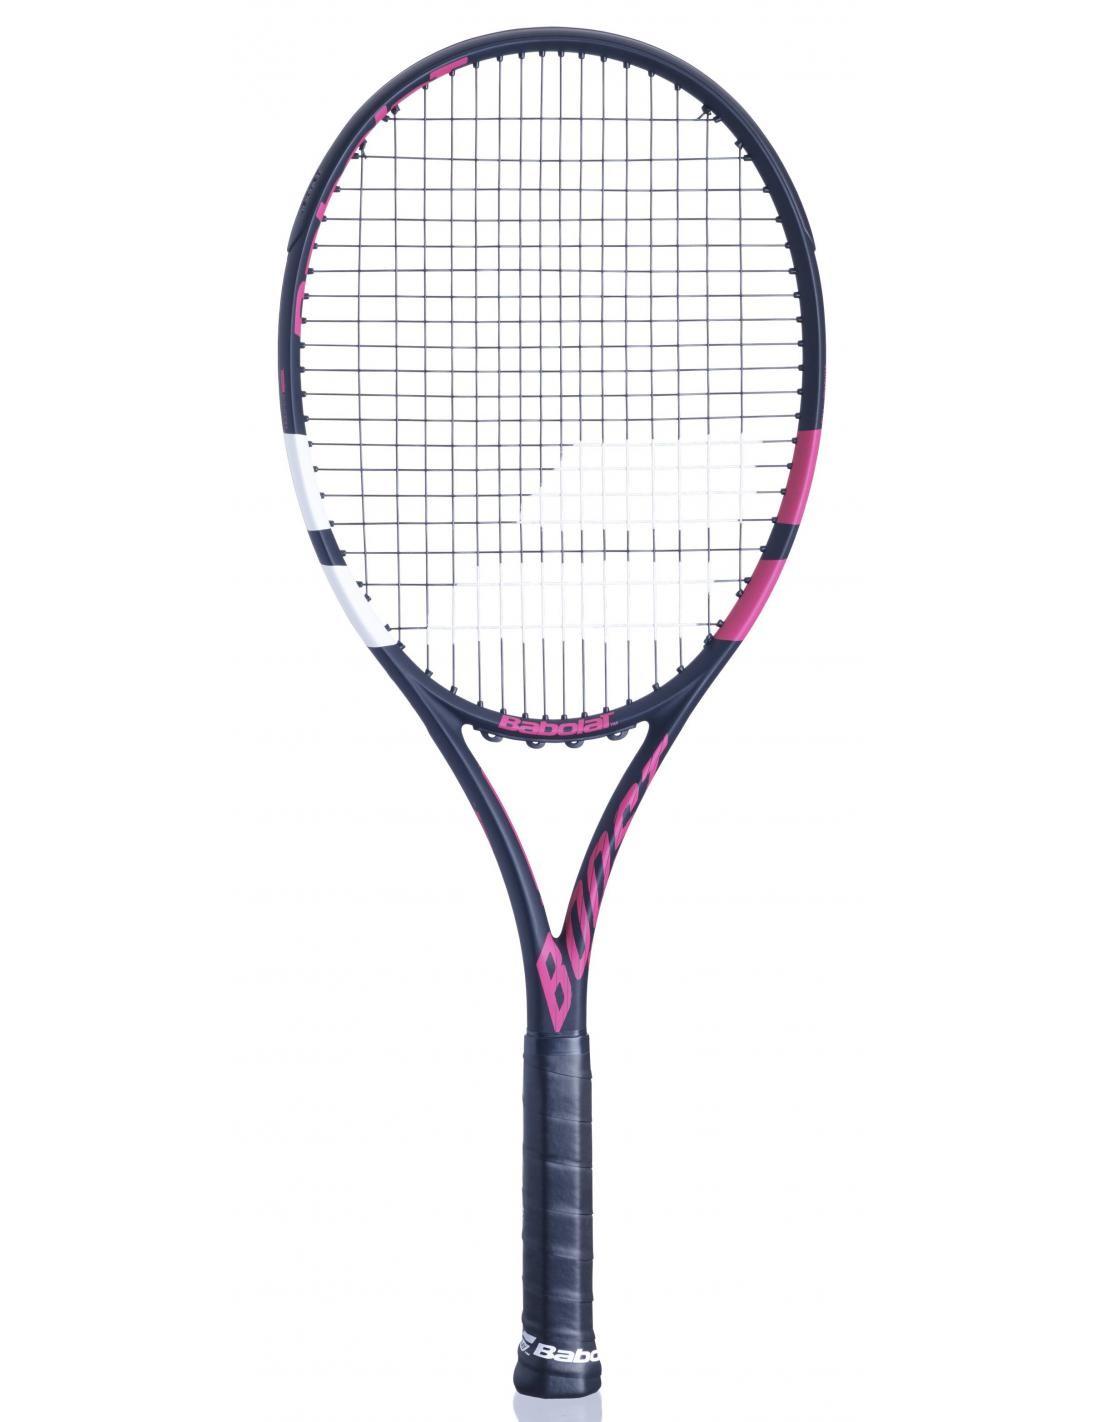 Rakieta tenisowa Babolat Boost Aero WMN